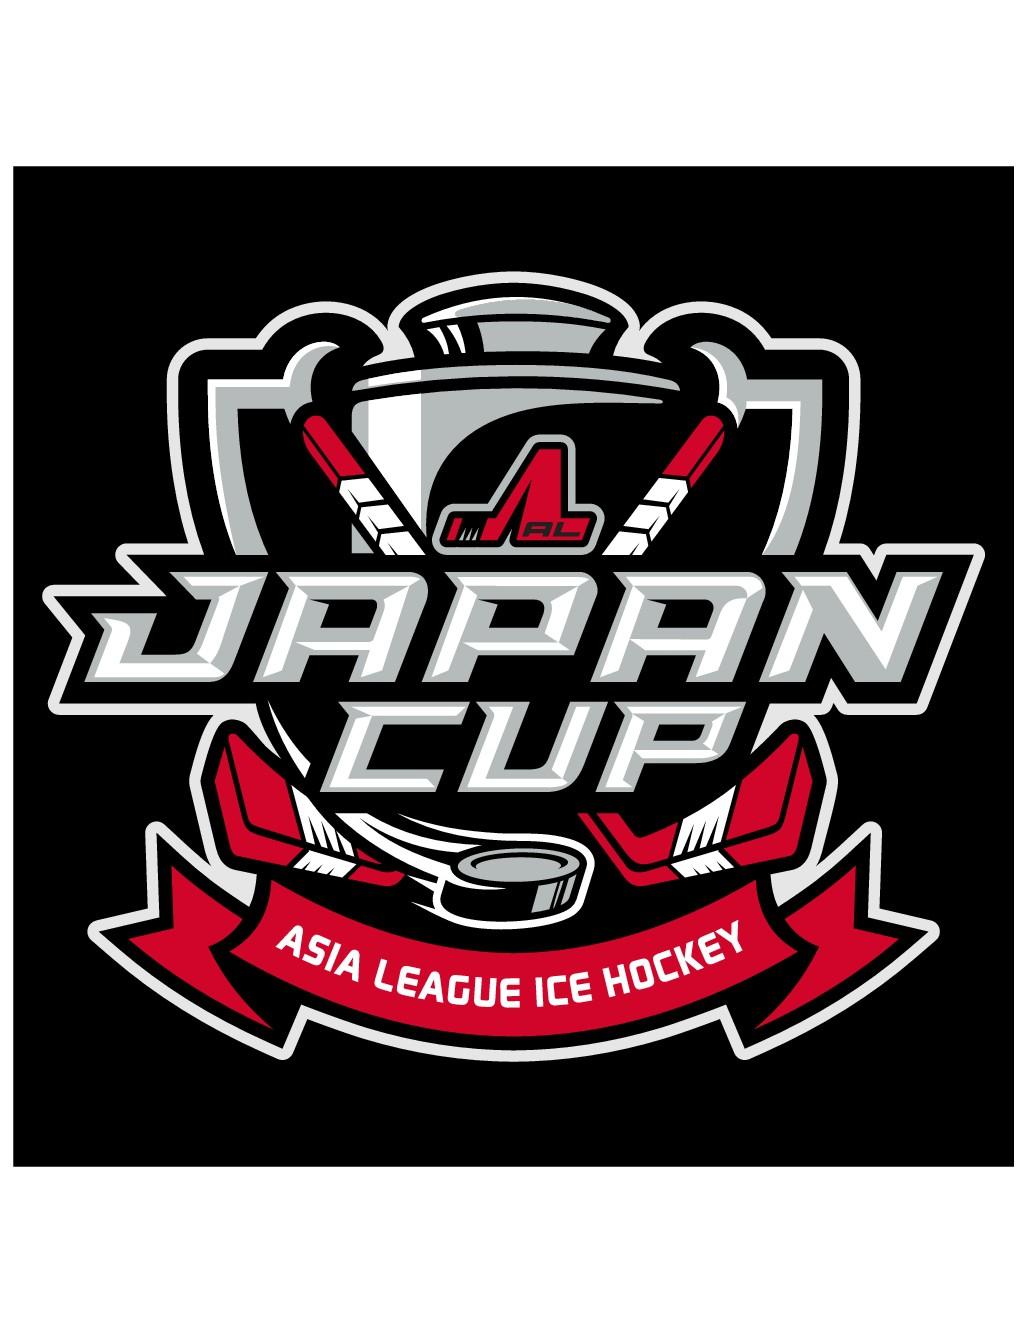 Japanese  Professional Ice Hockey league Event Logo